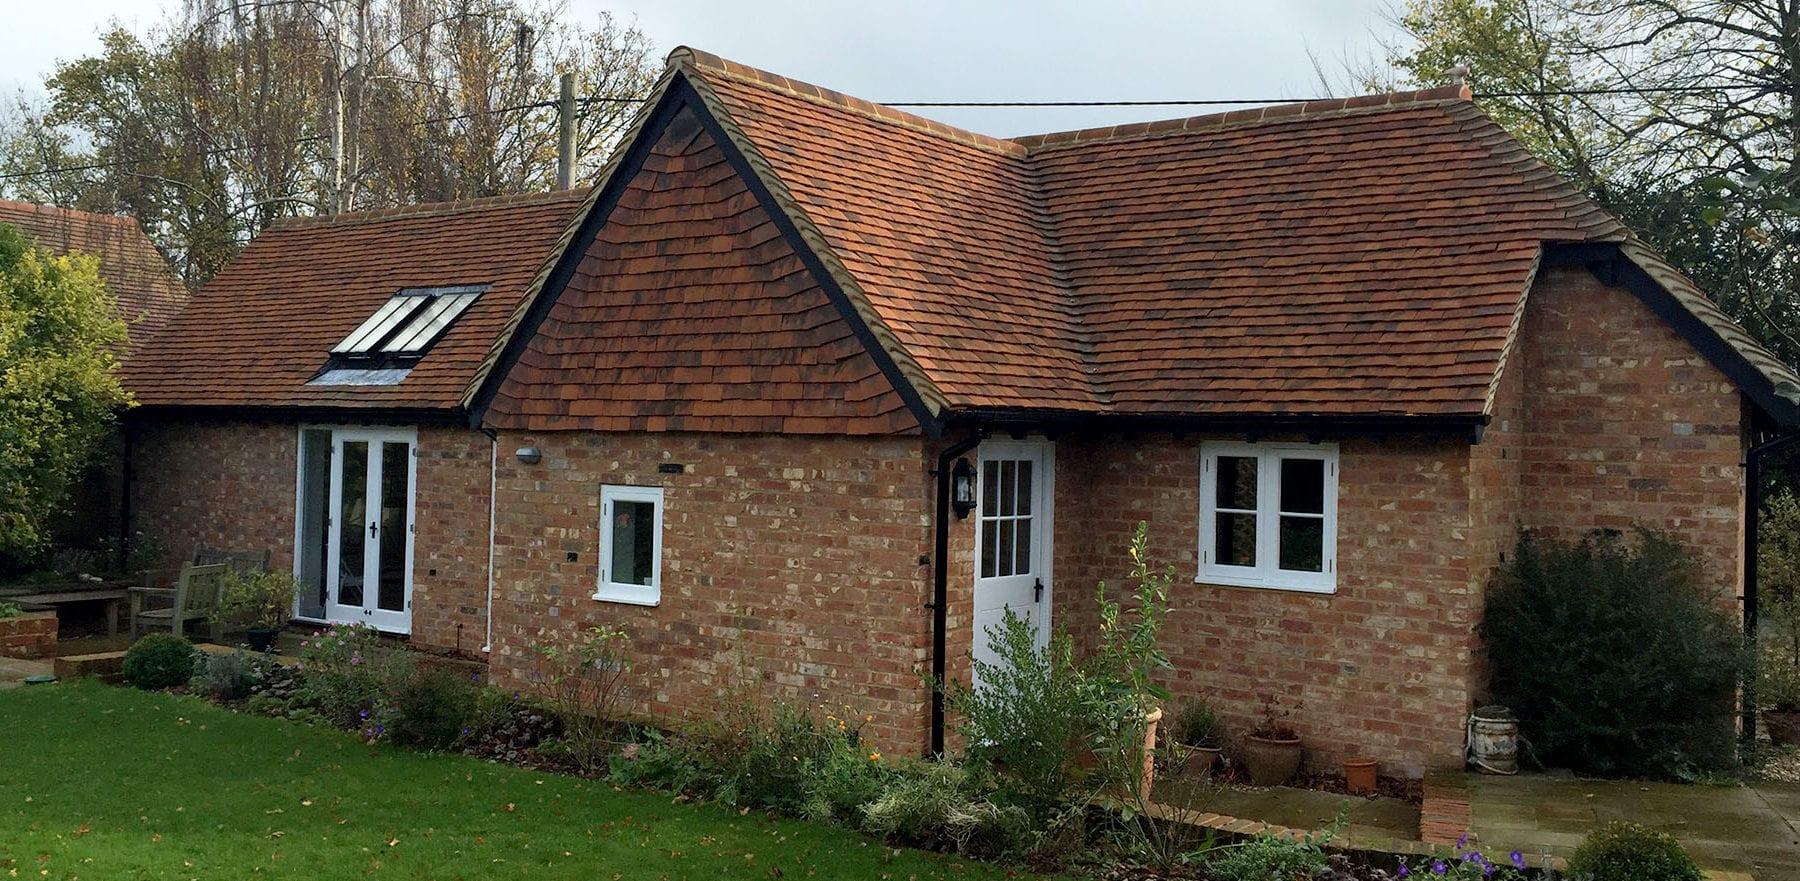 Lifestiles - Handmade Berkshire Clay Roof Tiles - Thatcham, England 3